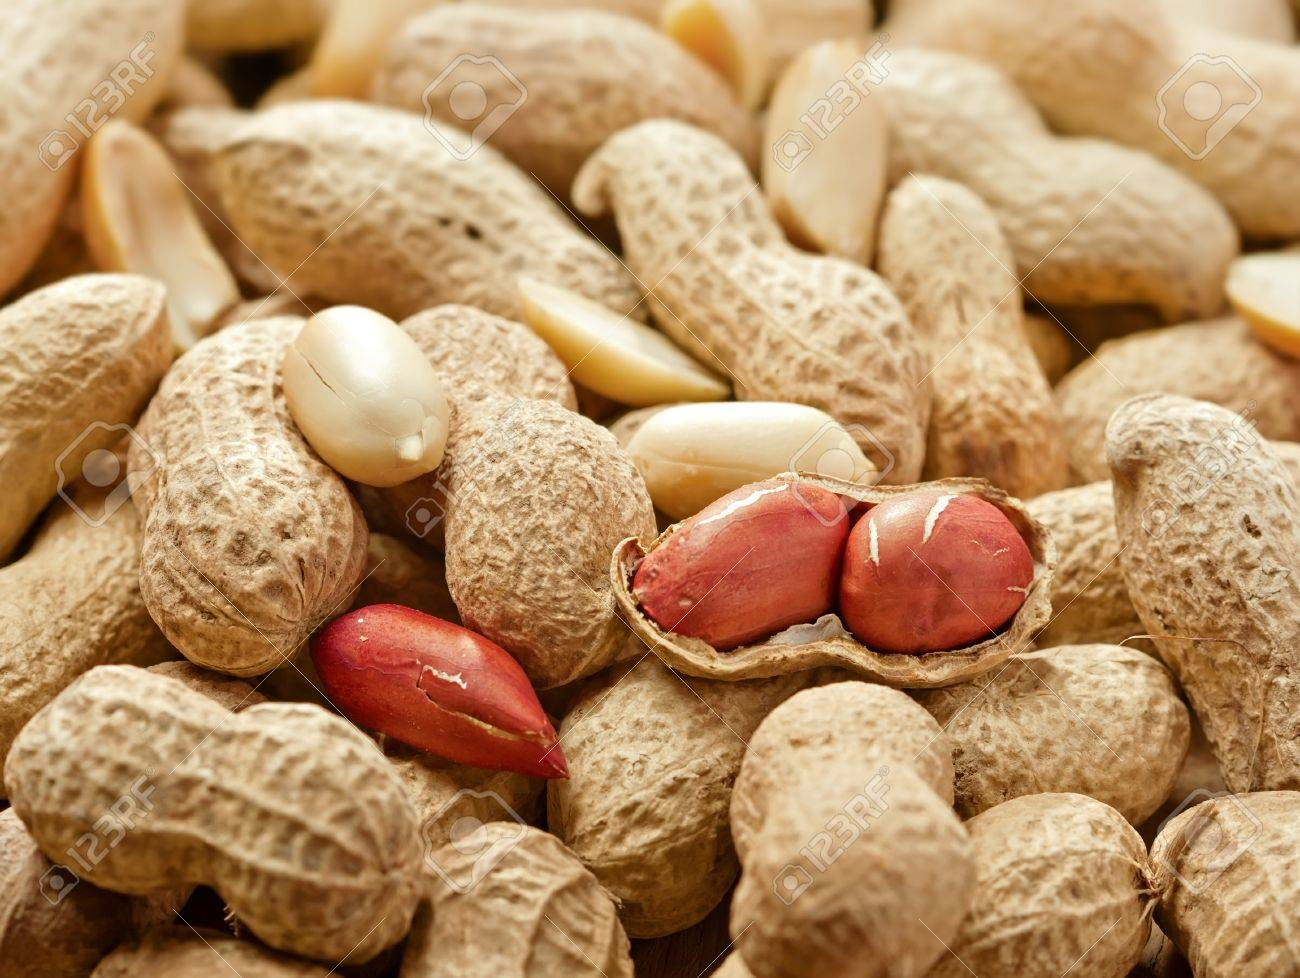 Peeled peanut andl peanuts in shell, studio shot Stock Photo - 14119735